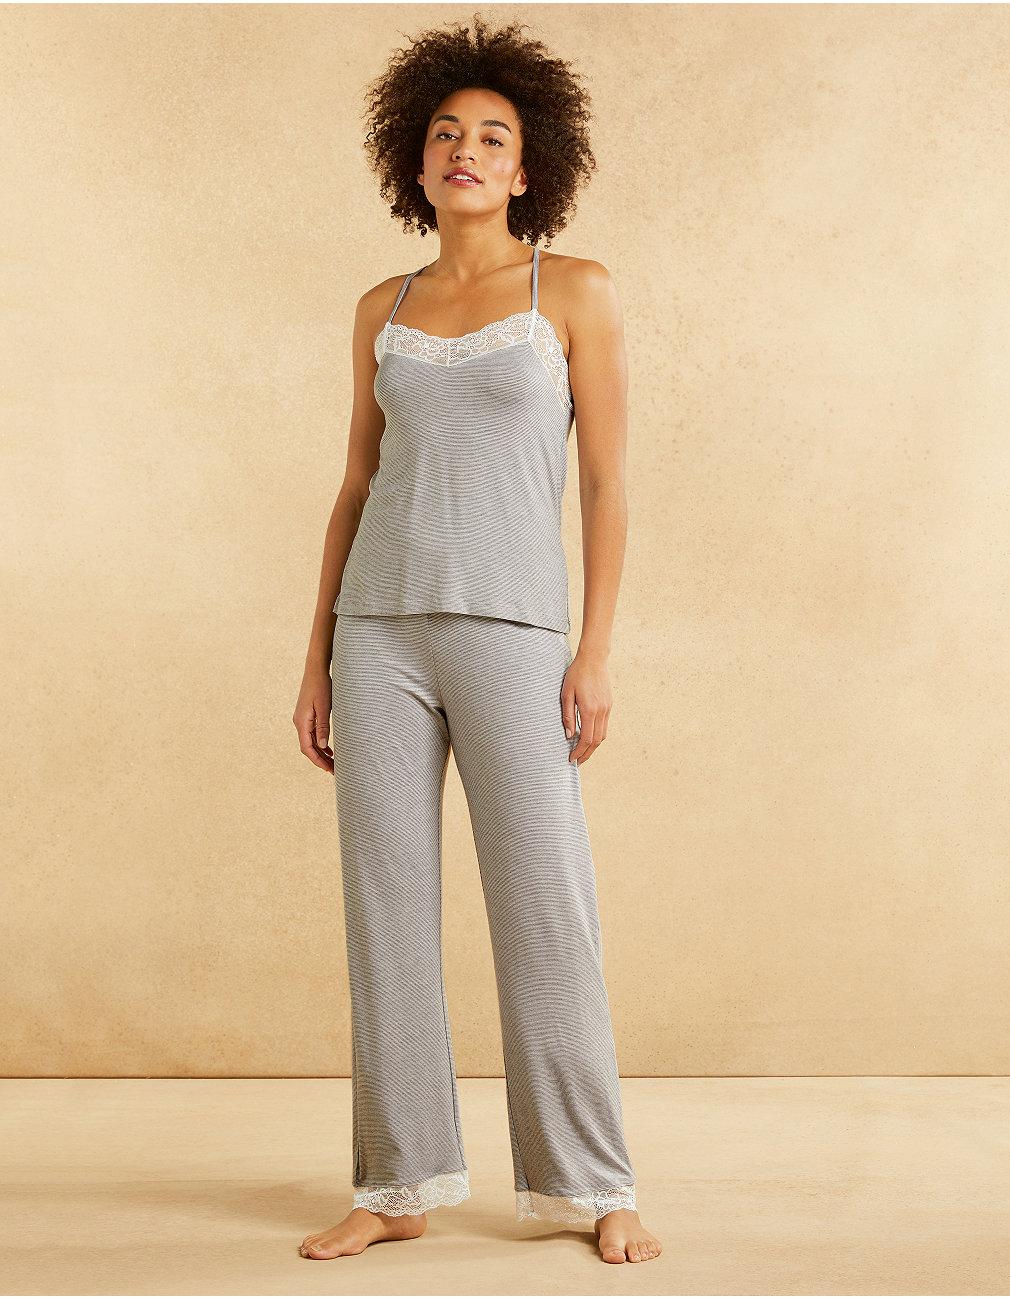 1aece45210 Jersey Stripe Lace Back Pajama Set